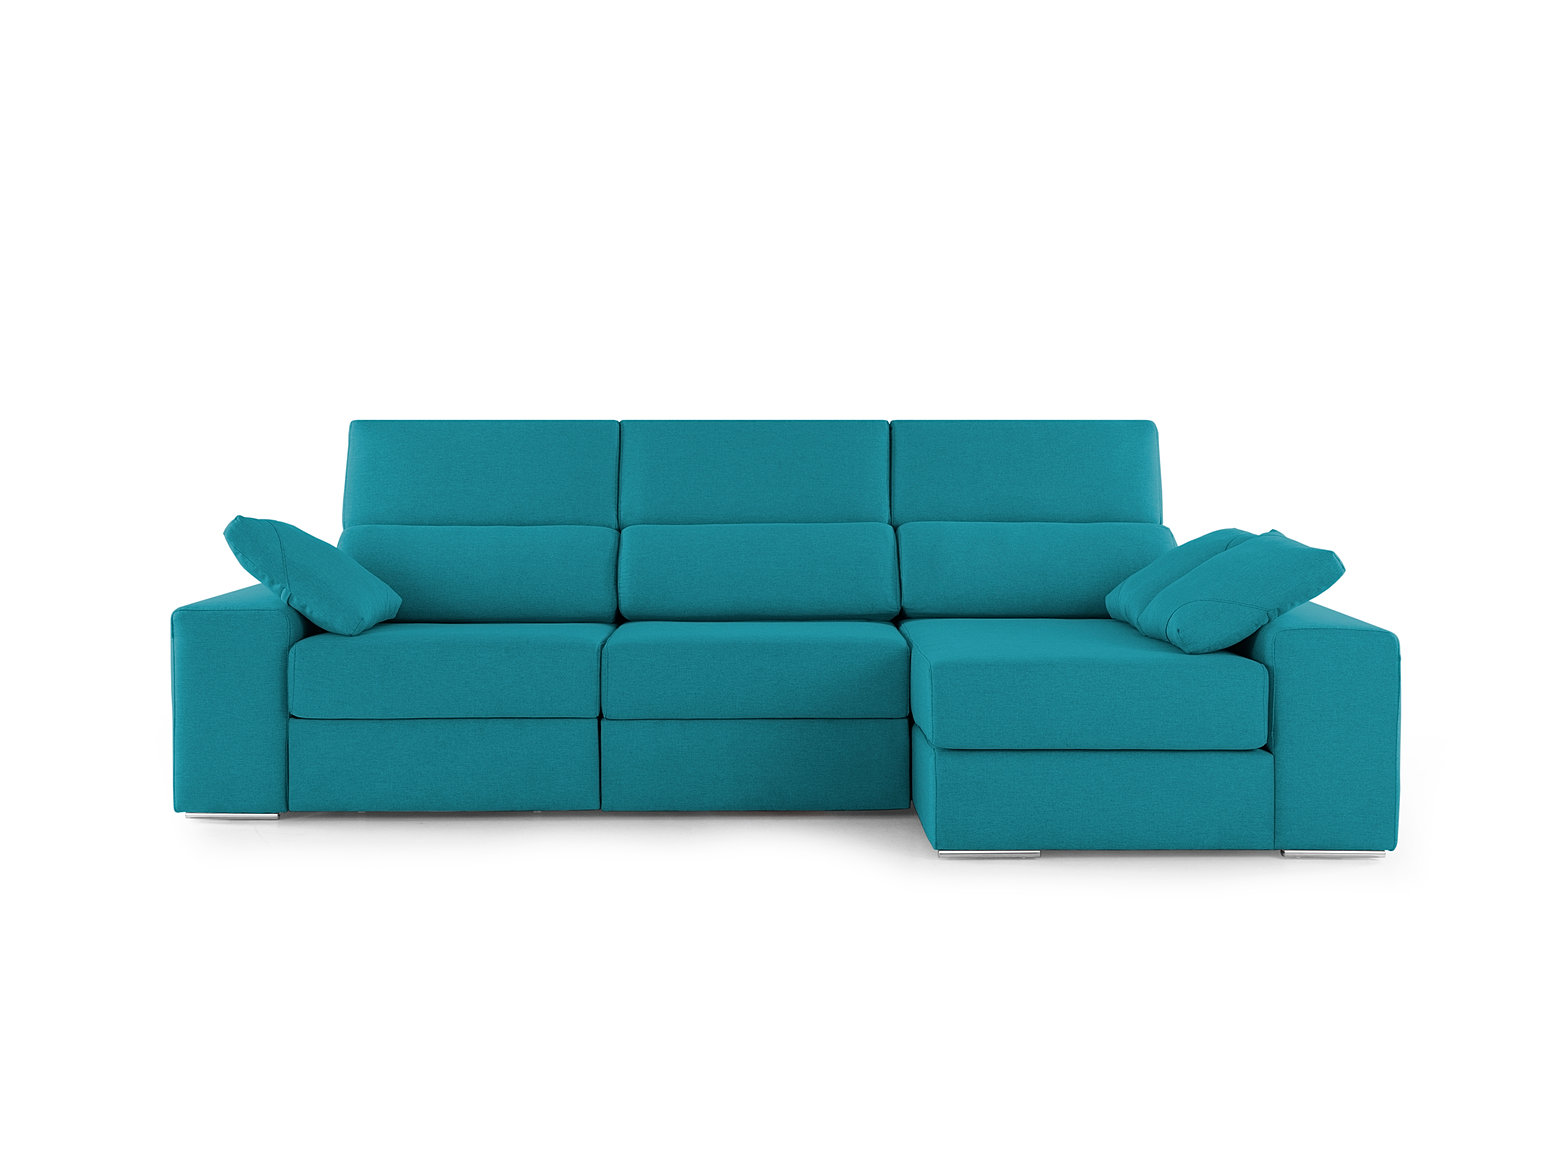 Big sofass marbella sof s chaiselongues en marbella - Sofas en marbella ...